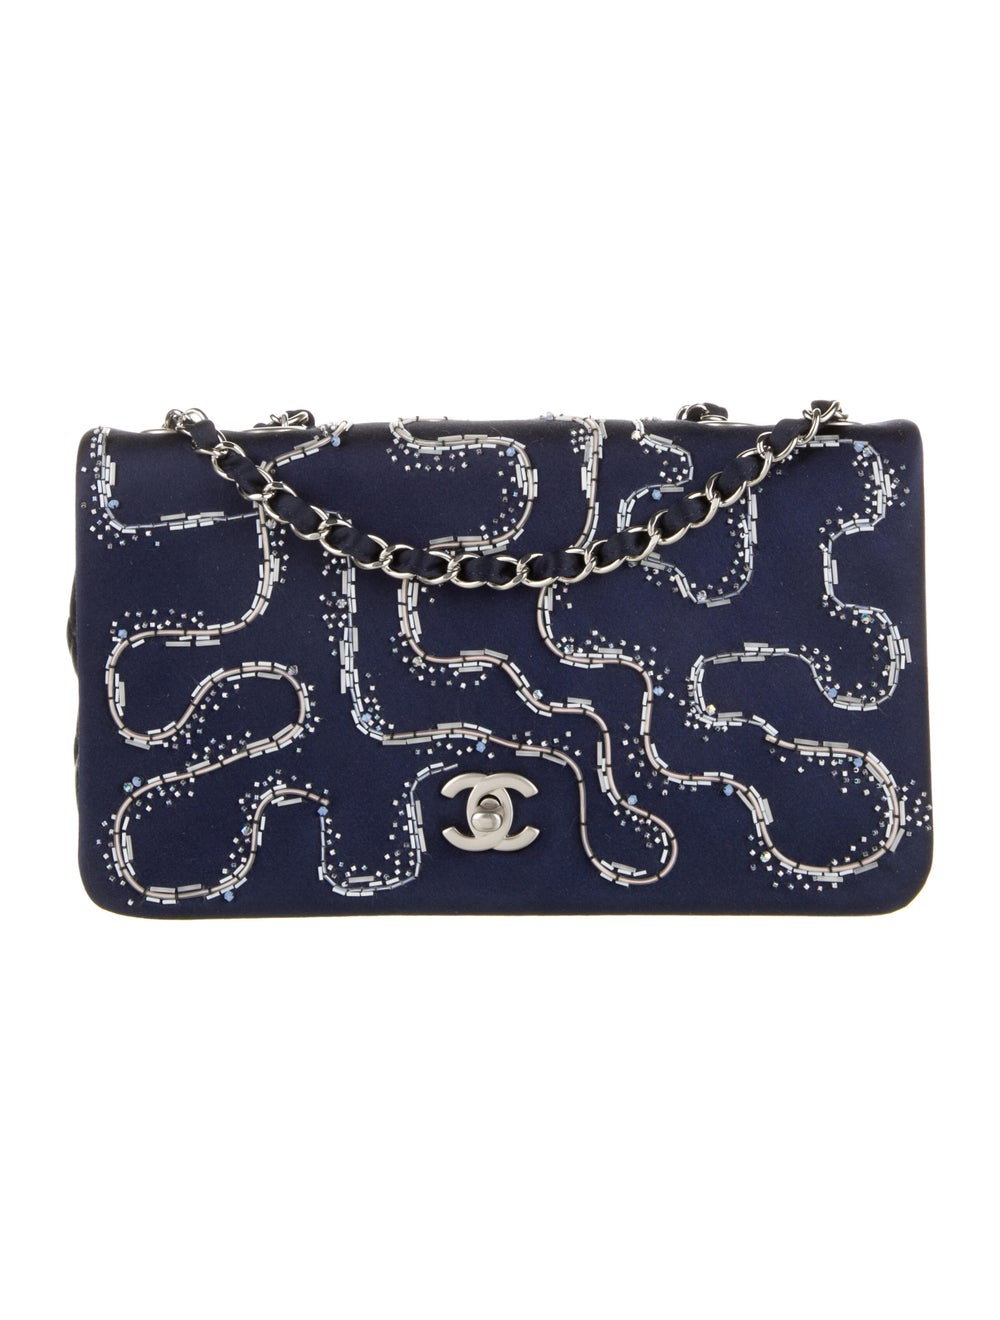 Chanel Satin LED Flap Bag Blue - image 1